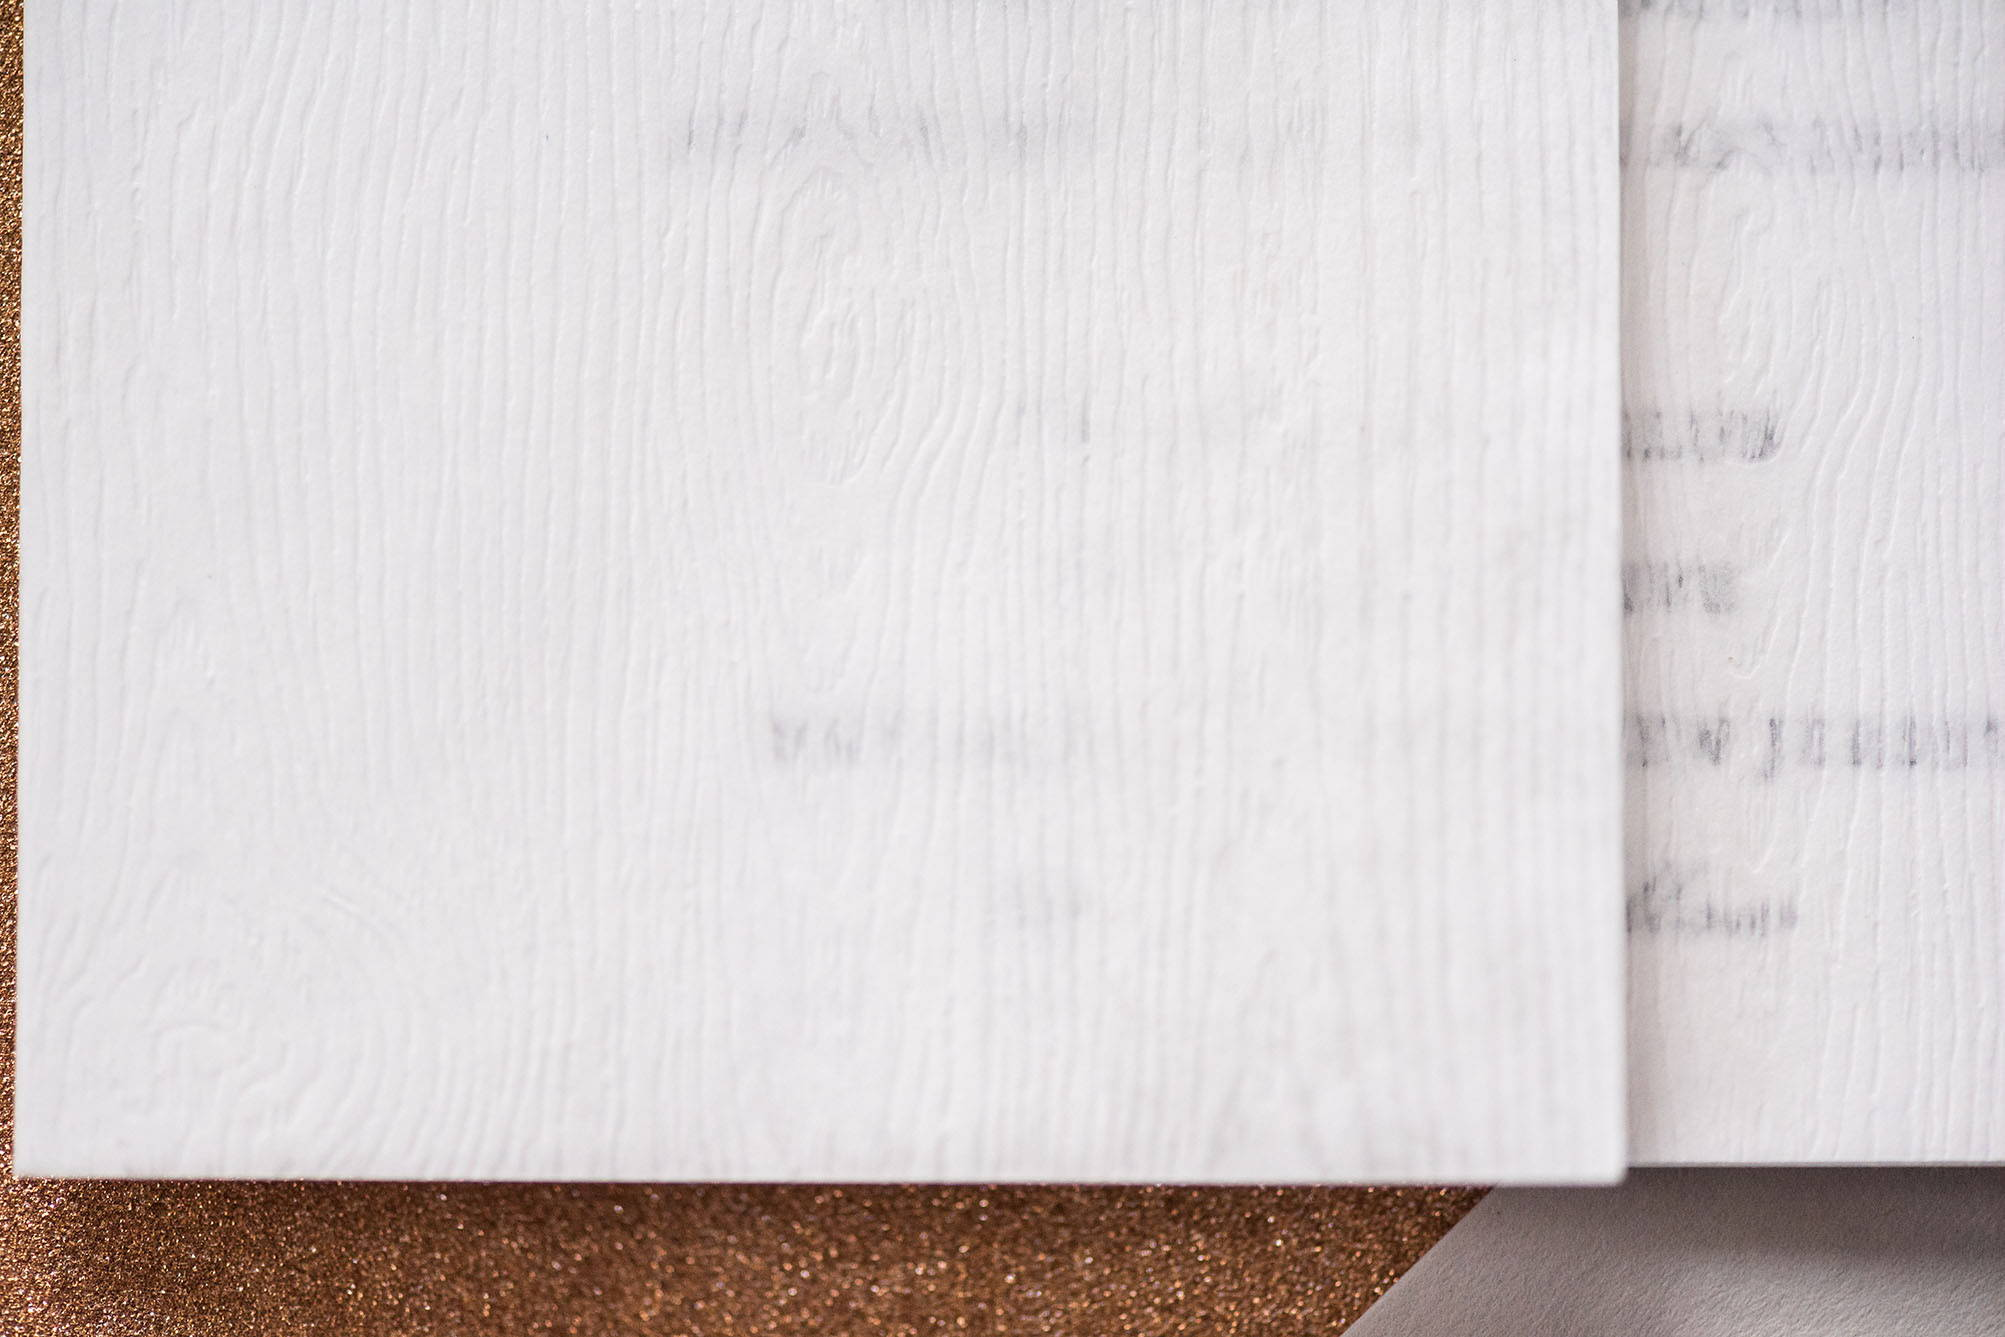 custom invitation, bespoke invitation, rustic vellum, rustic invitation, wood grain paper, wood grain vellum